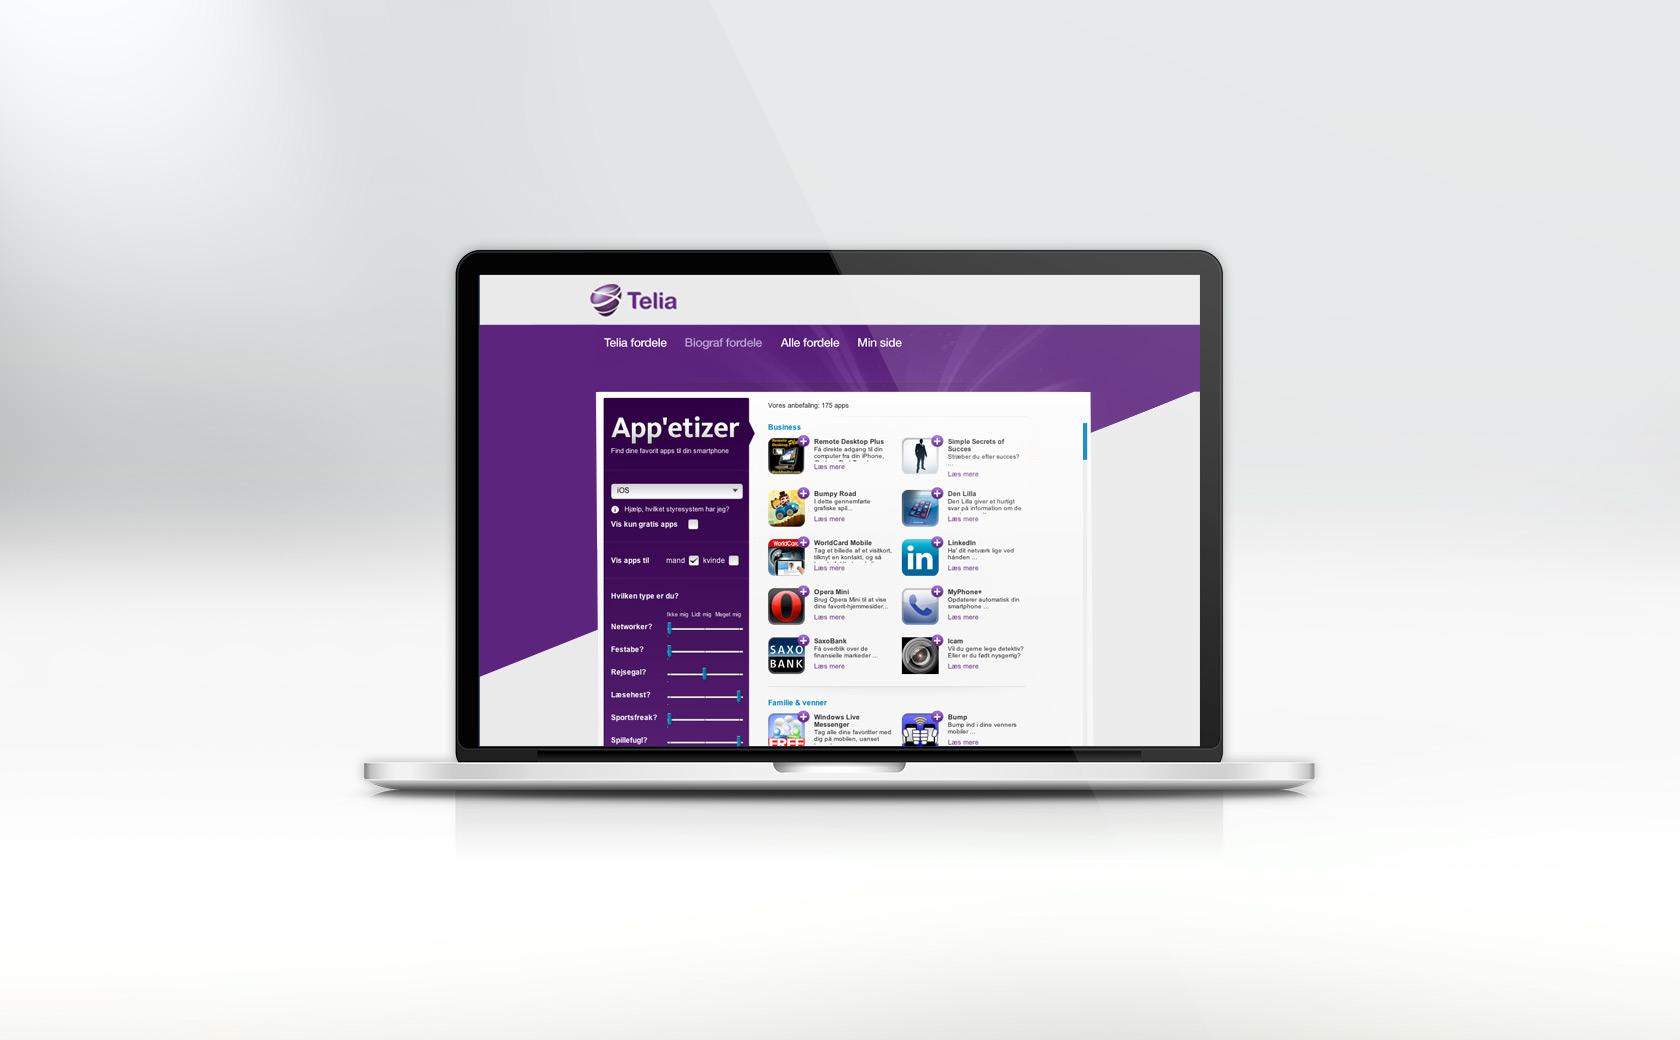 Telia-App-ettizer